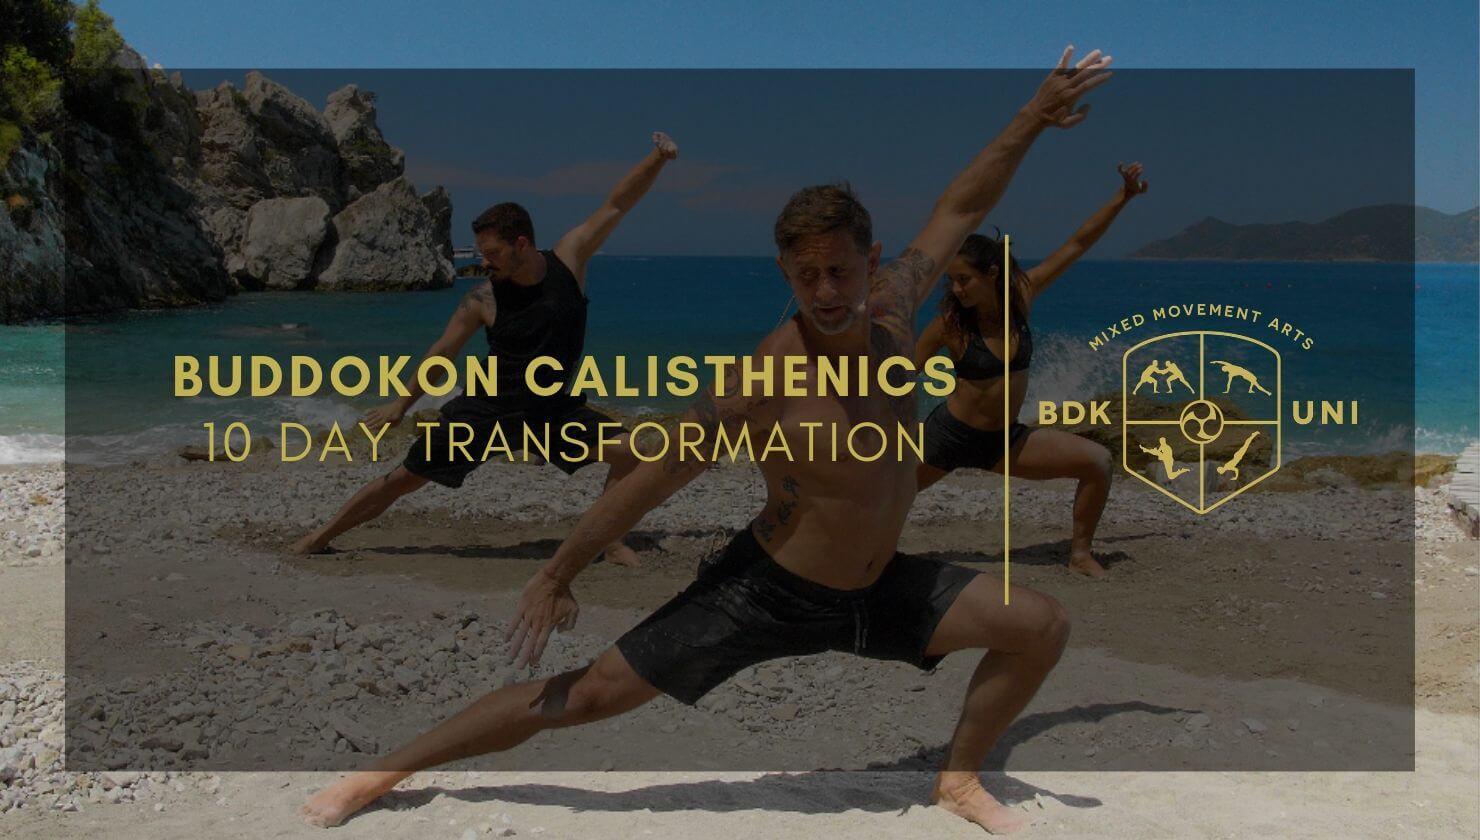 Budokon Calisthenics by Cameron Shayne - 10 Day Transformation